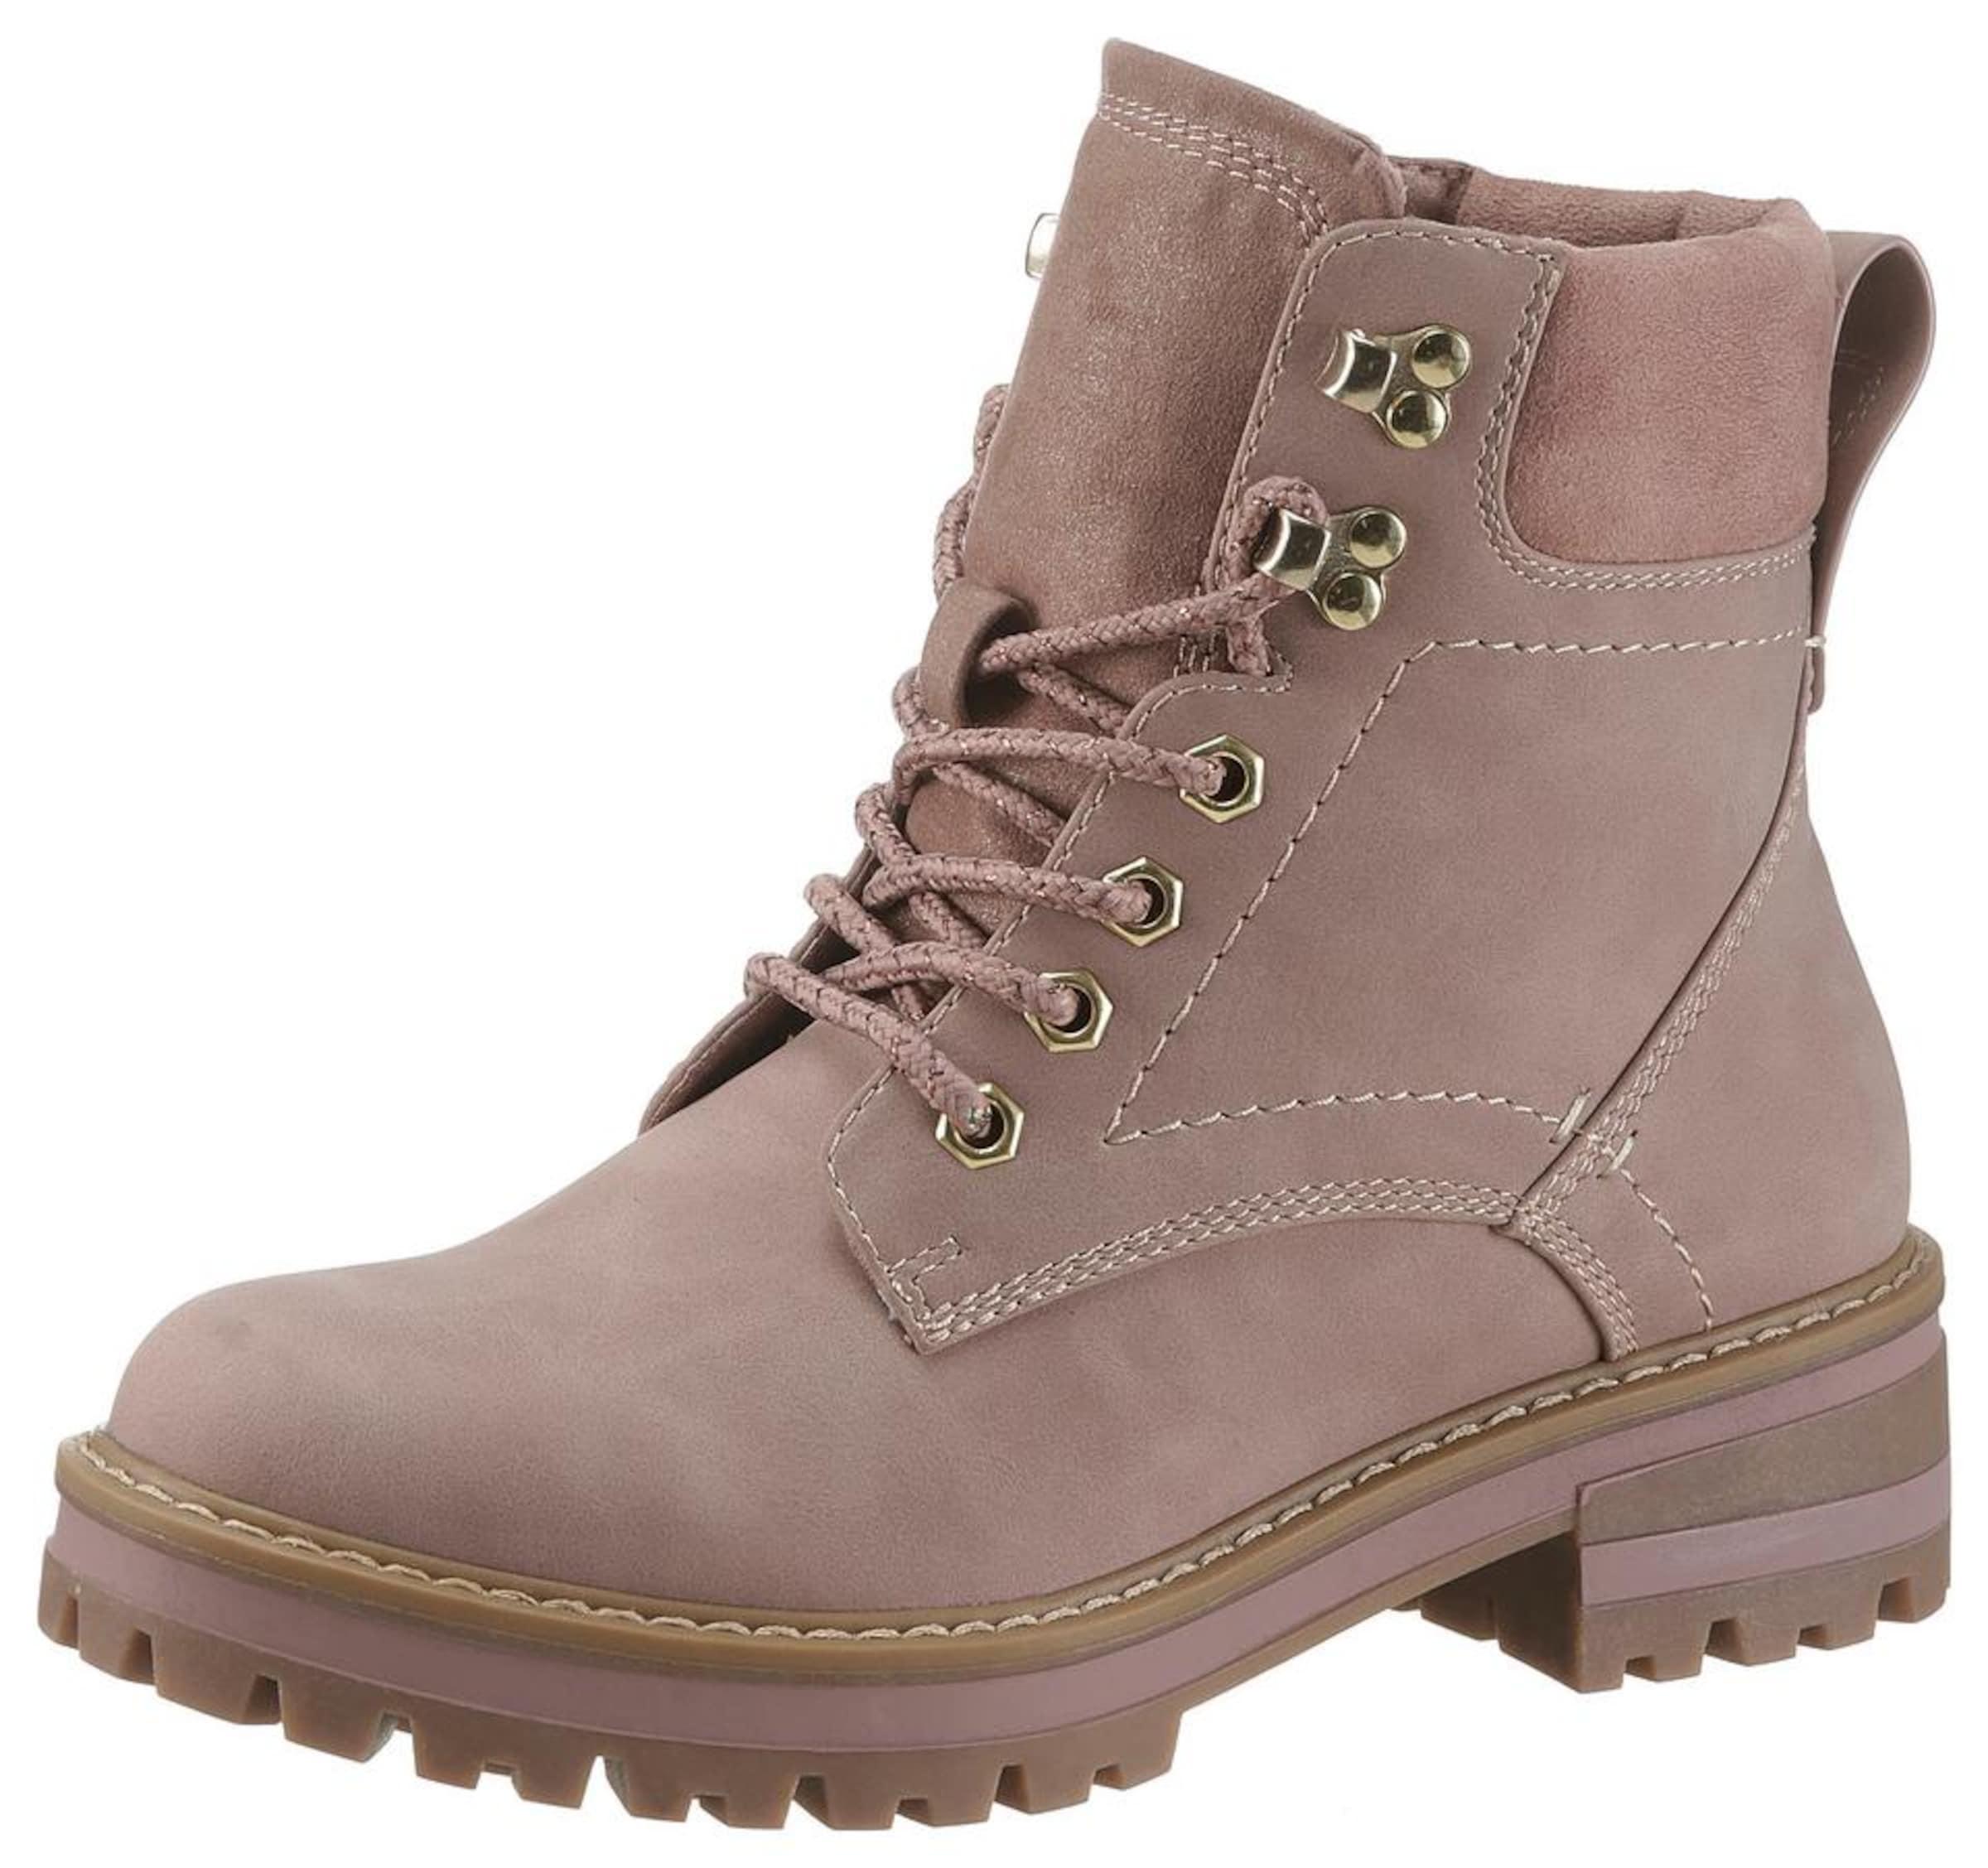 Boots Arizona Boots Altrosa In Arizona HE2IeWD9Y